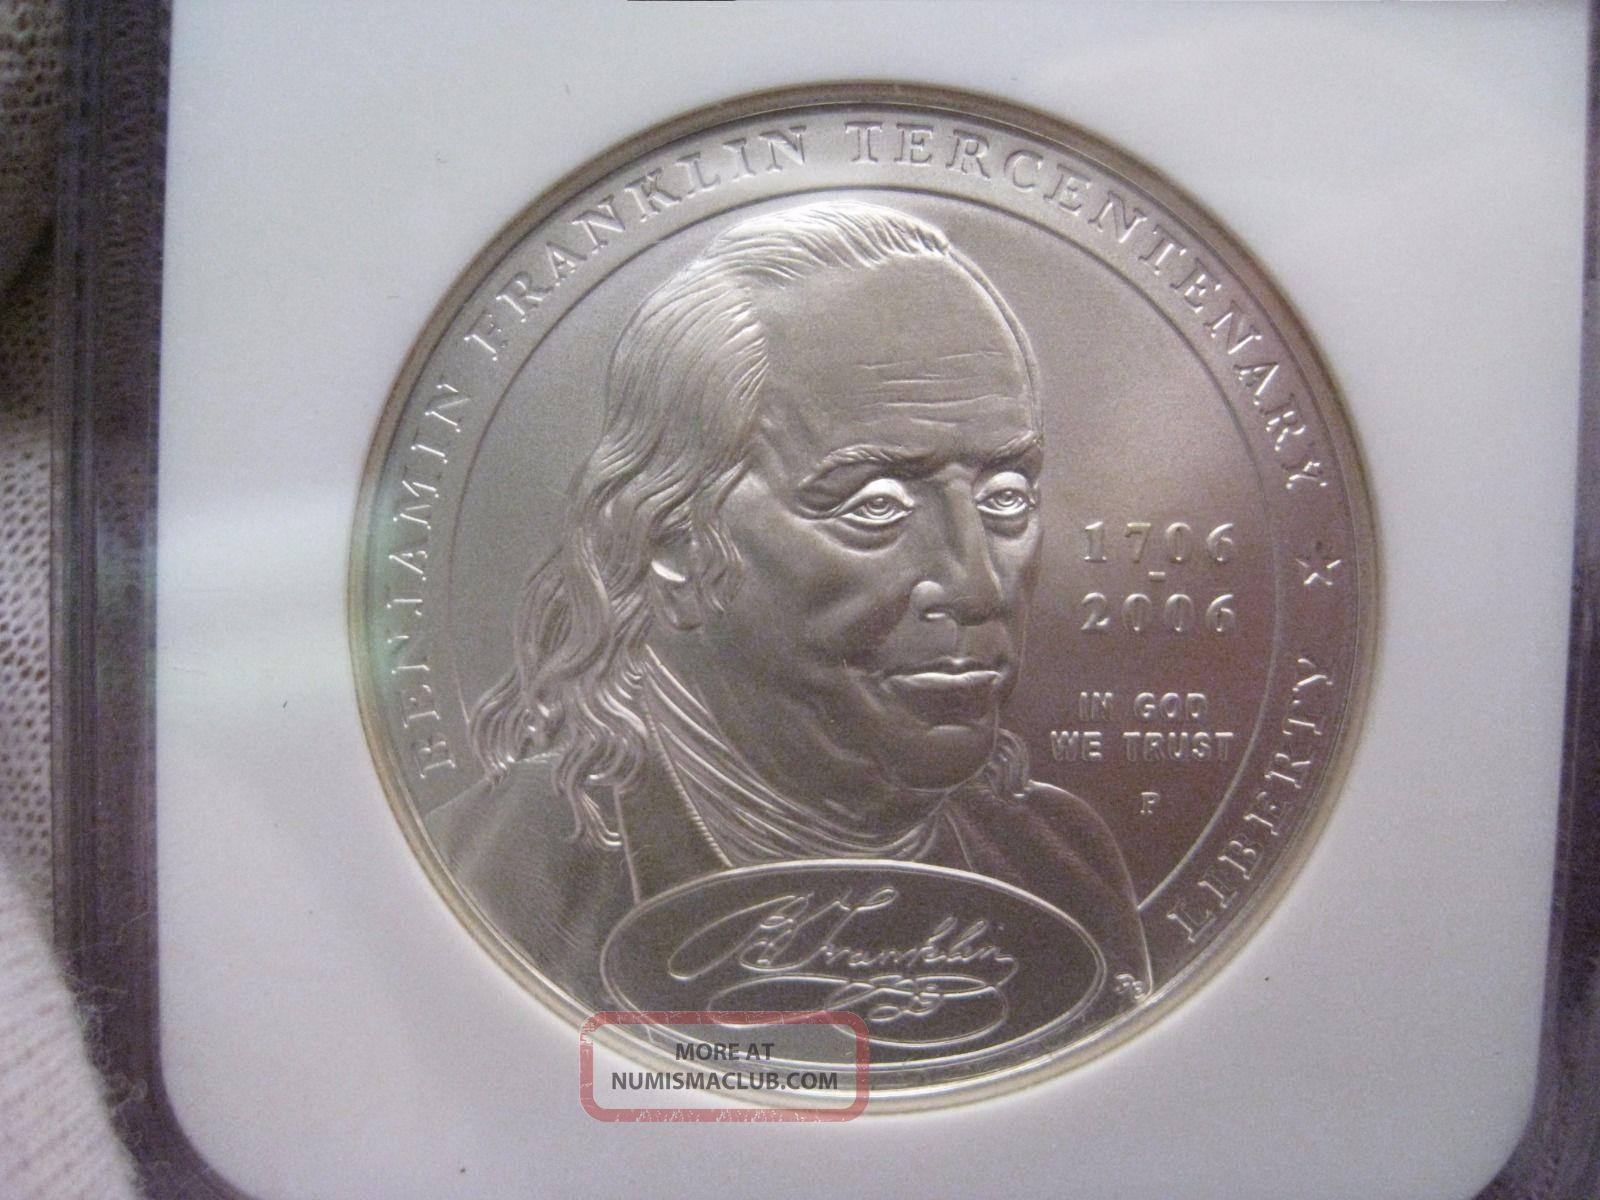 2006 ben franklin commemorative coins